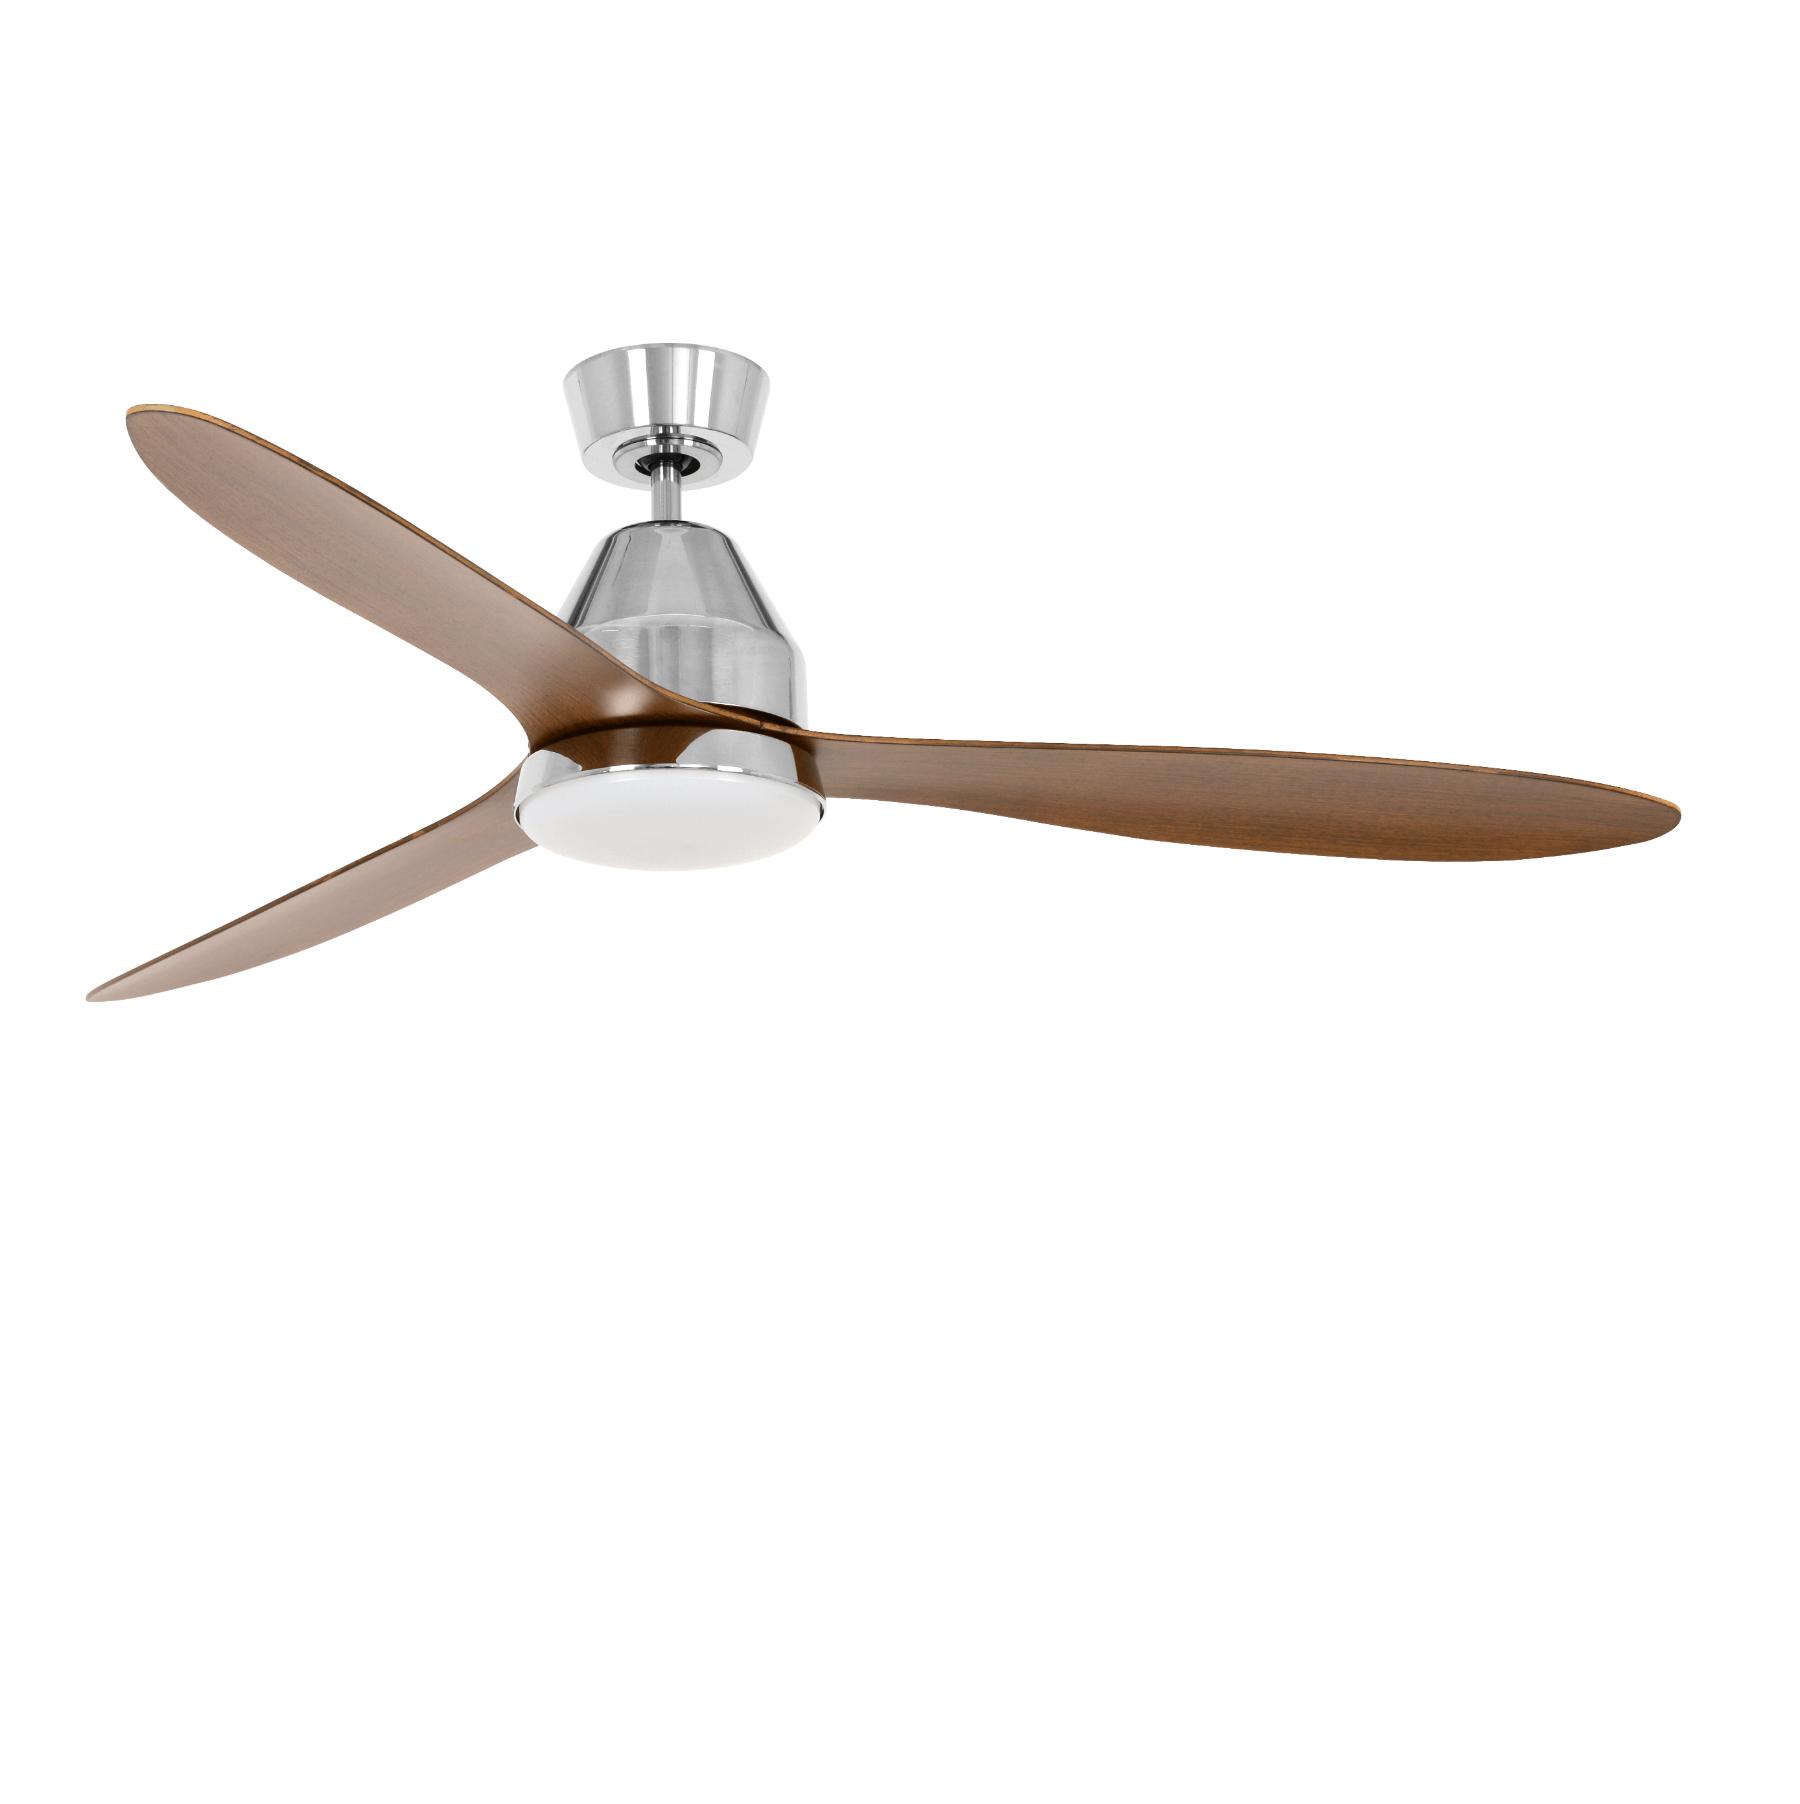 Stropný ventilátor Lucci Air Whitehaven 213045